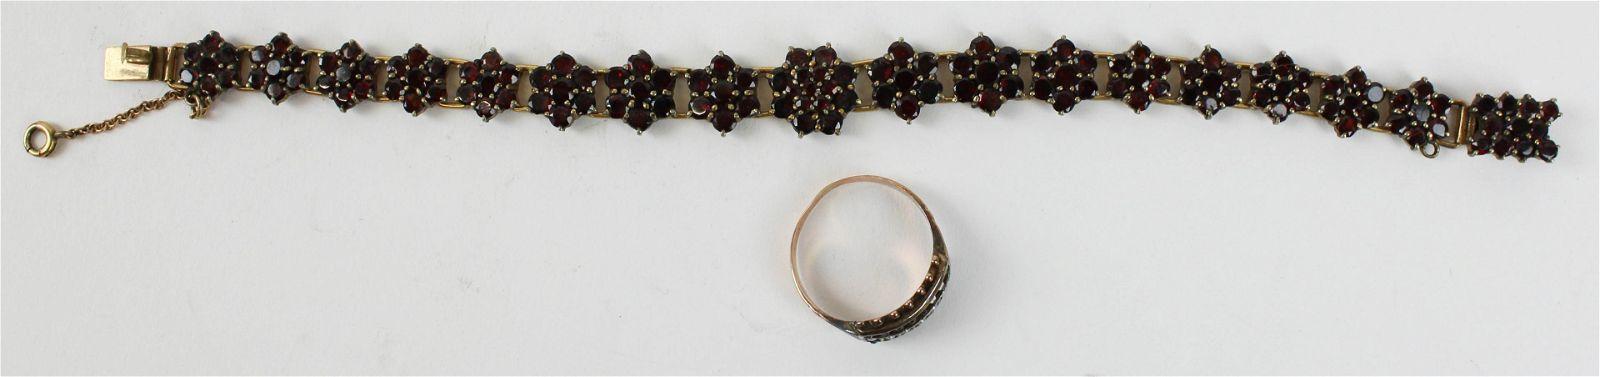 Victorian garnet bracelet and ring